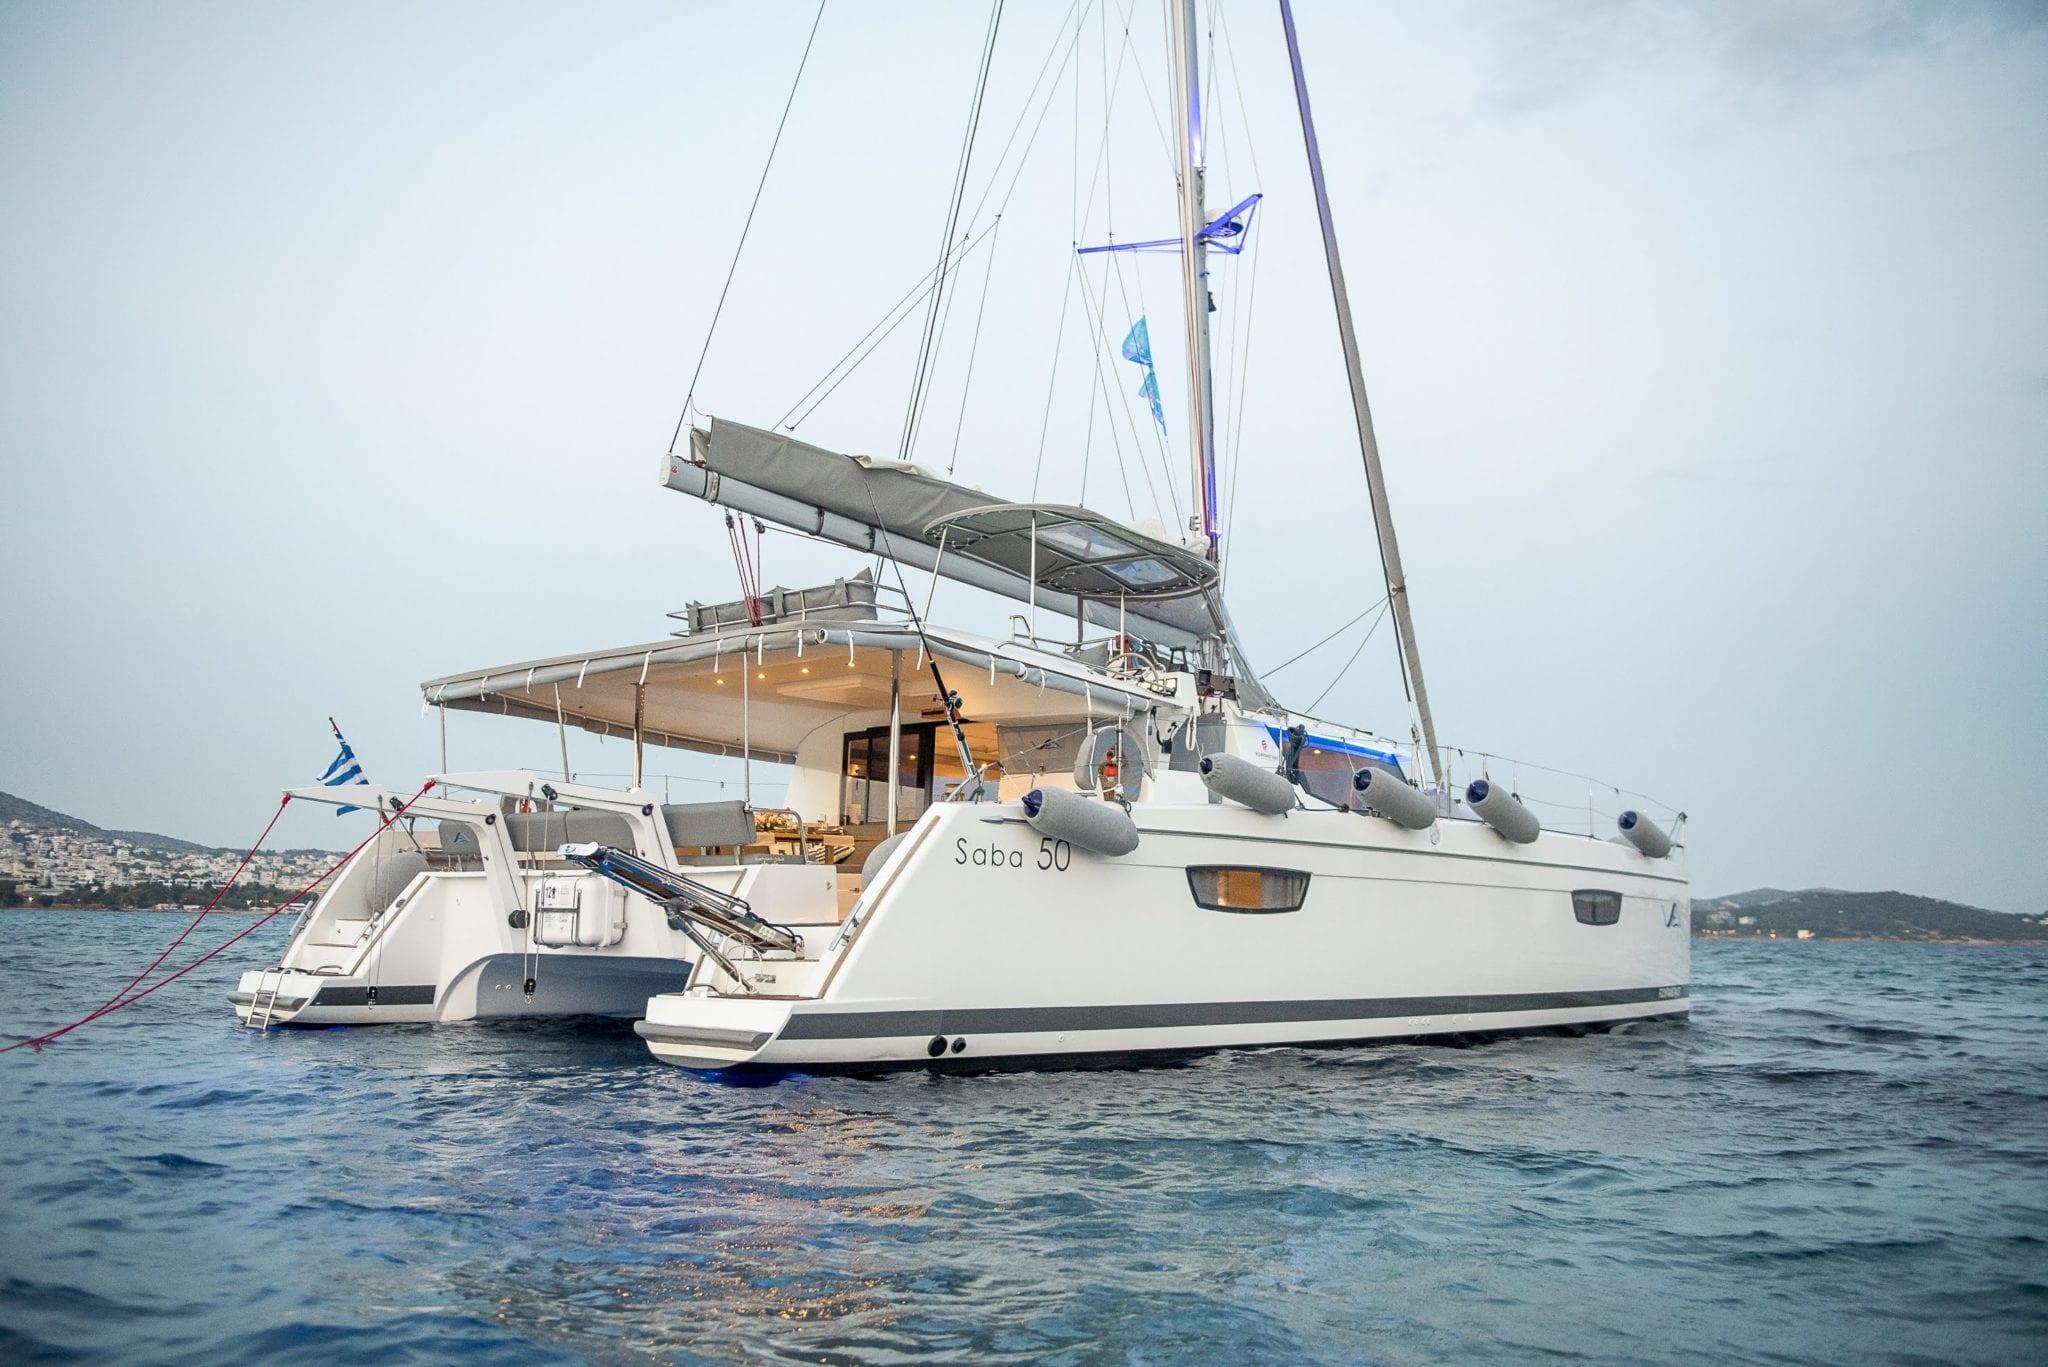 sea energy v catamaran profiles (2) -  Valef Yachts Chartering - 2105